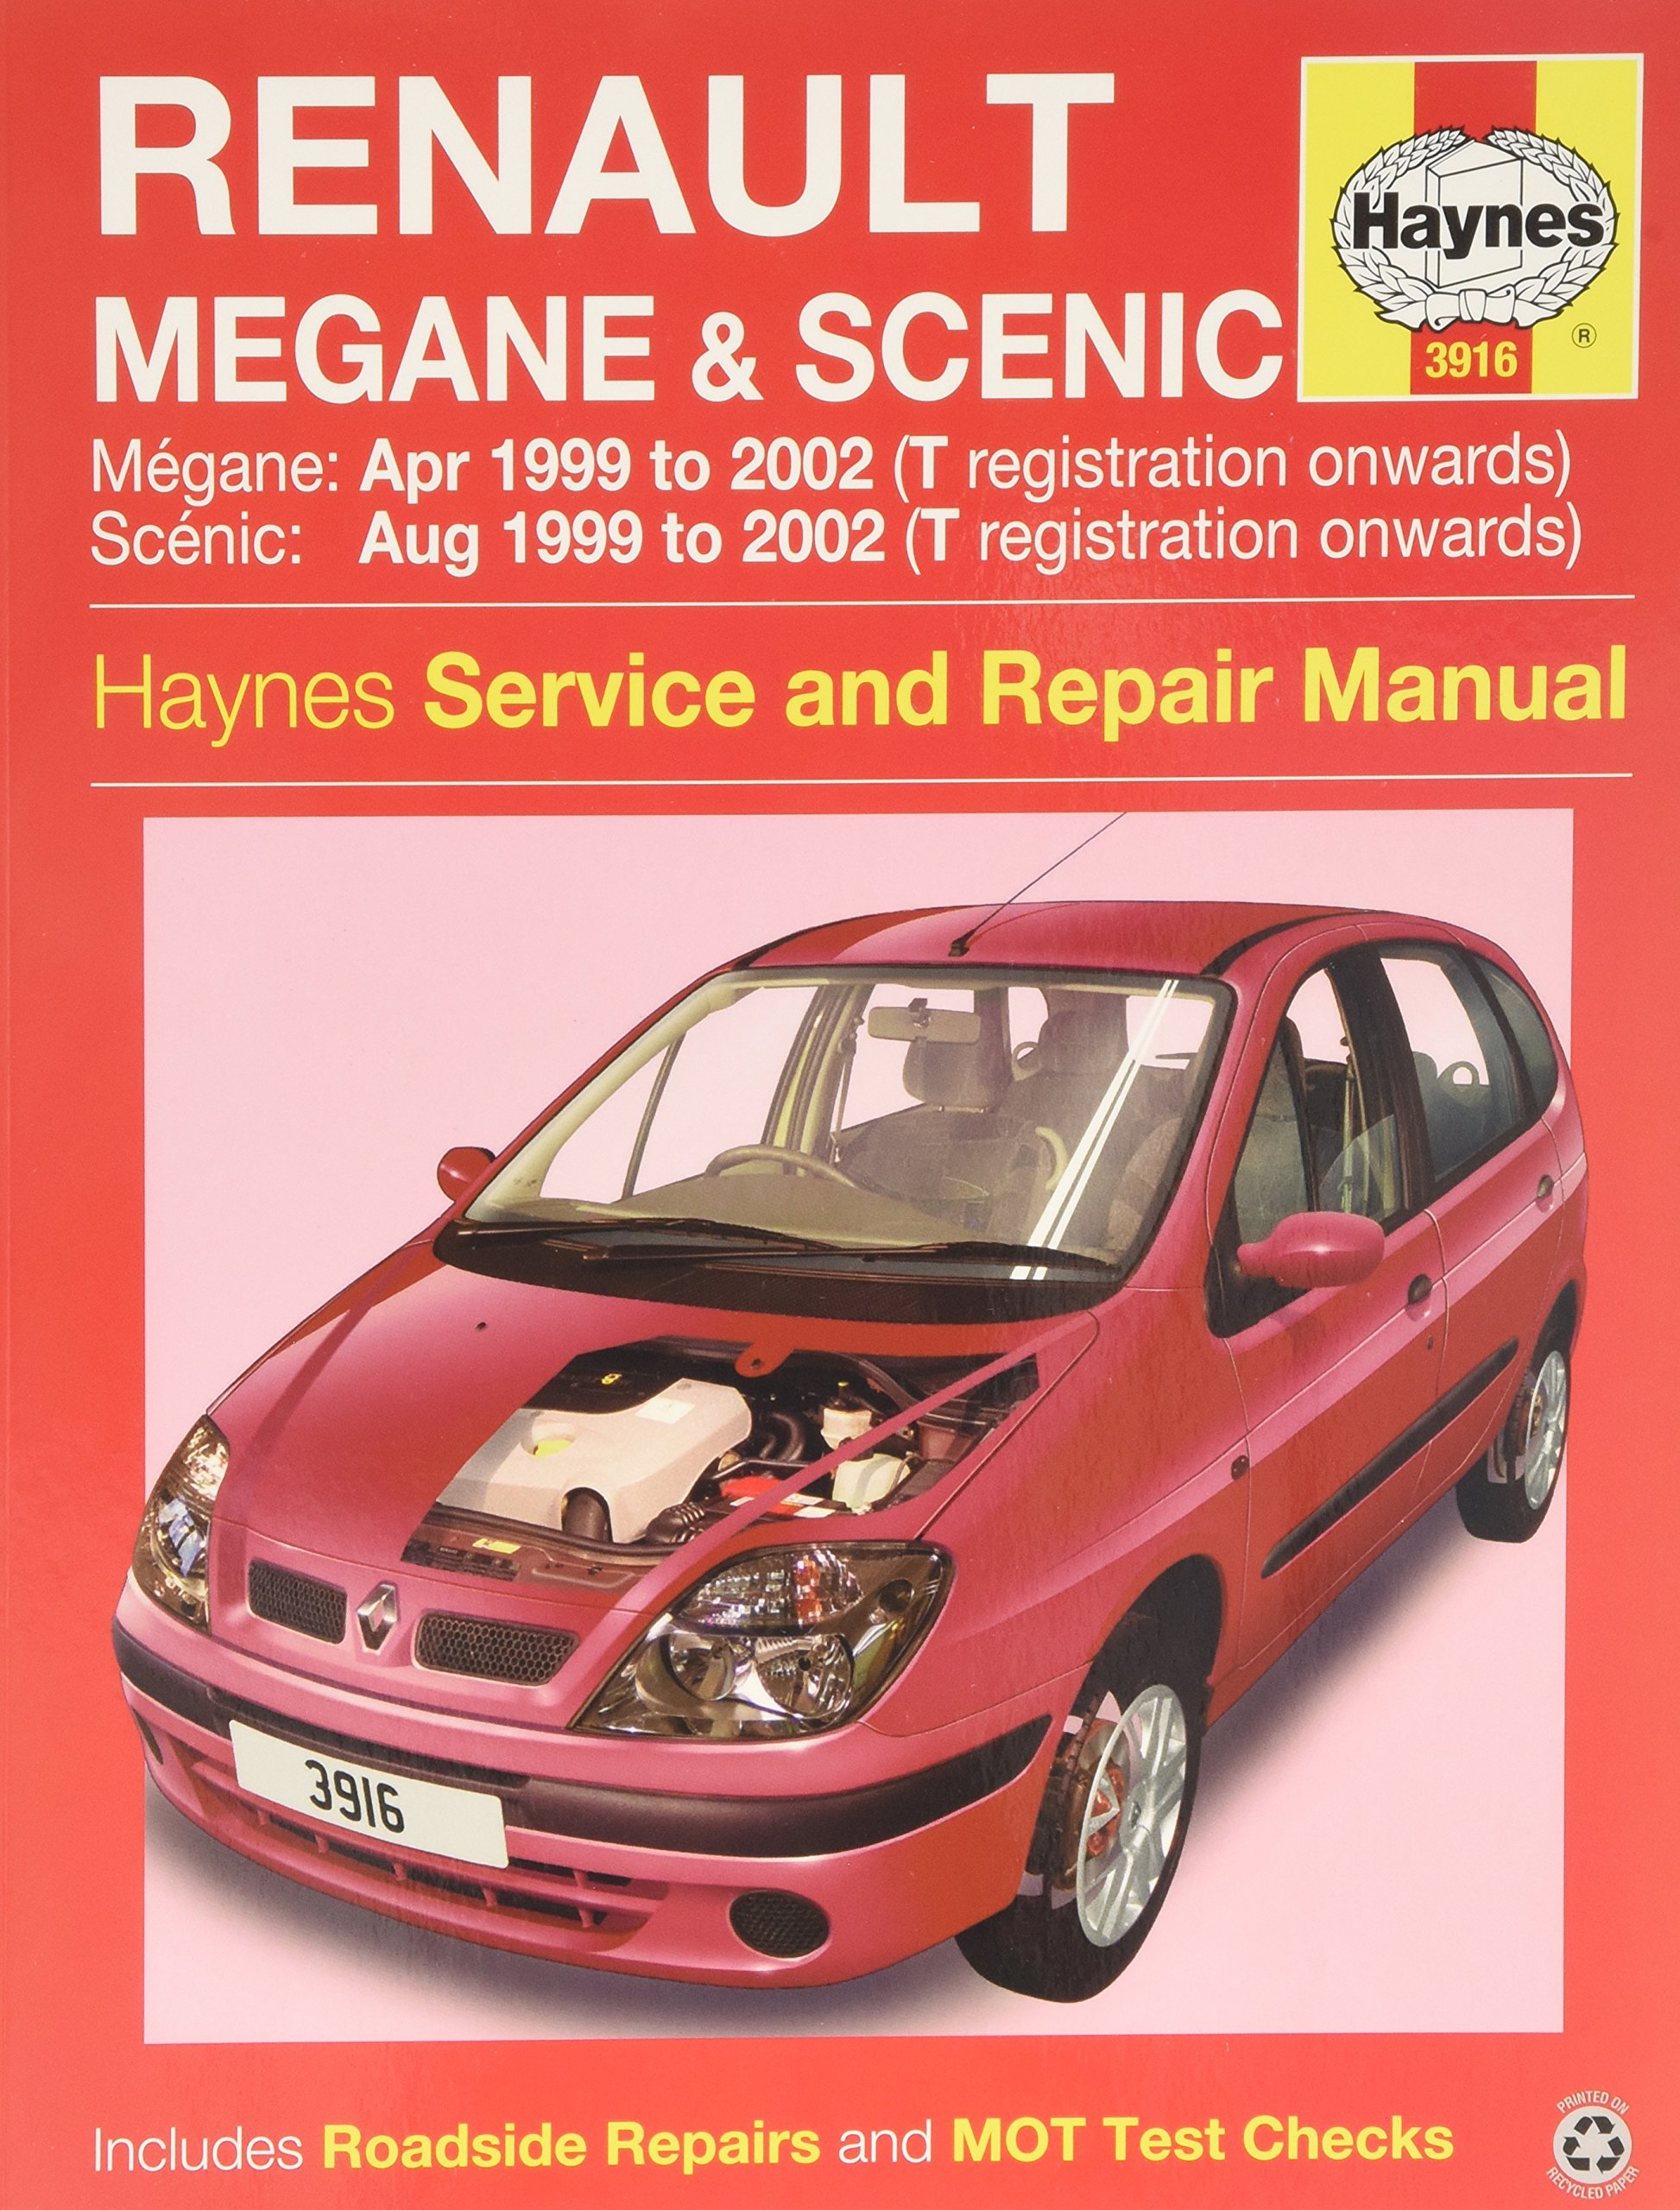 Renault Megane & Scenic 99-02: Haynes Publishing: 9781785210051:  Amazon.com: Books